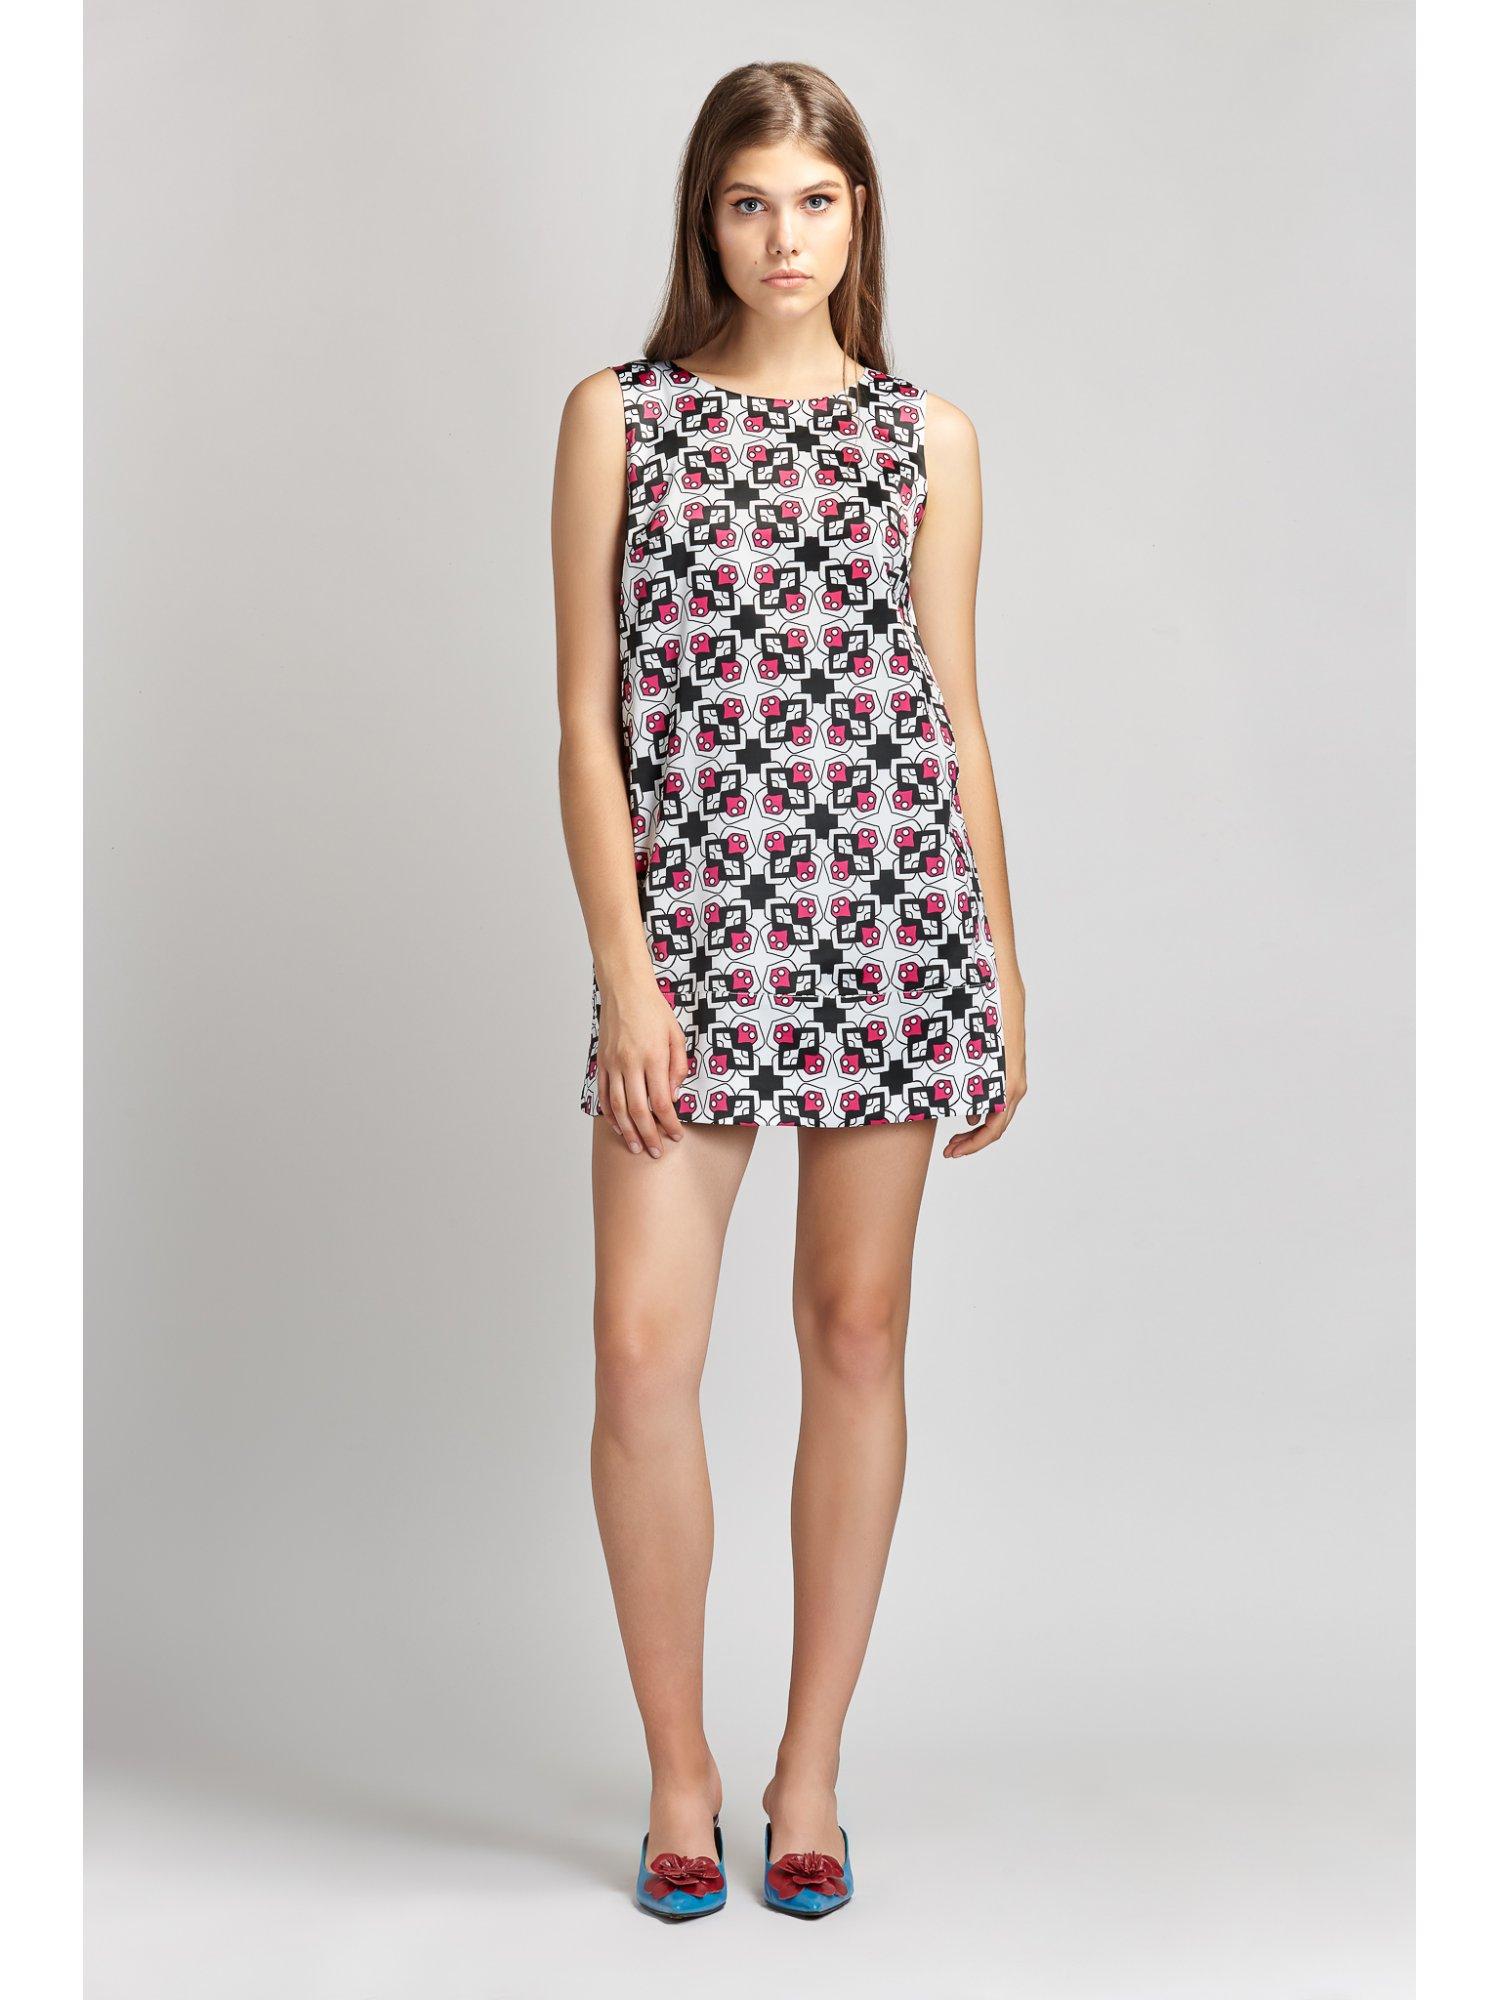 Carya dress